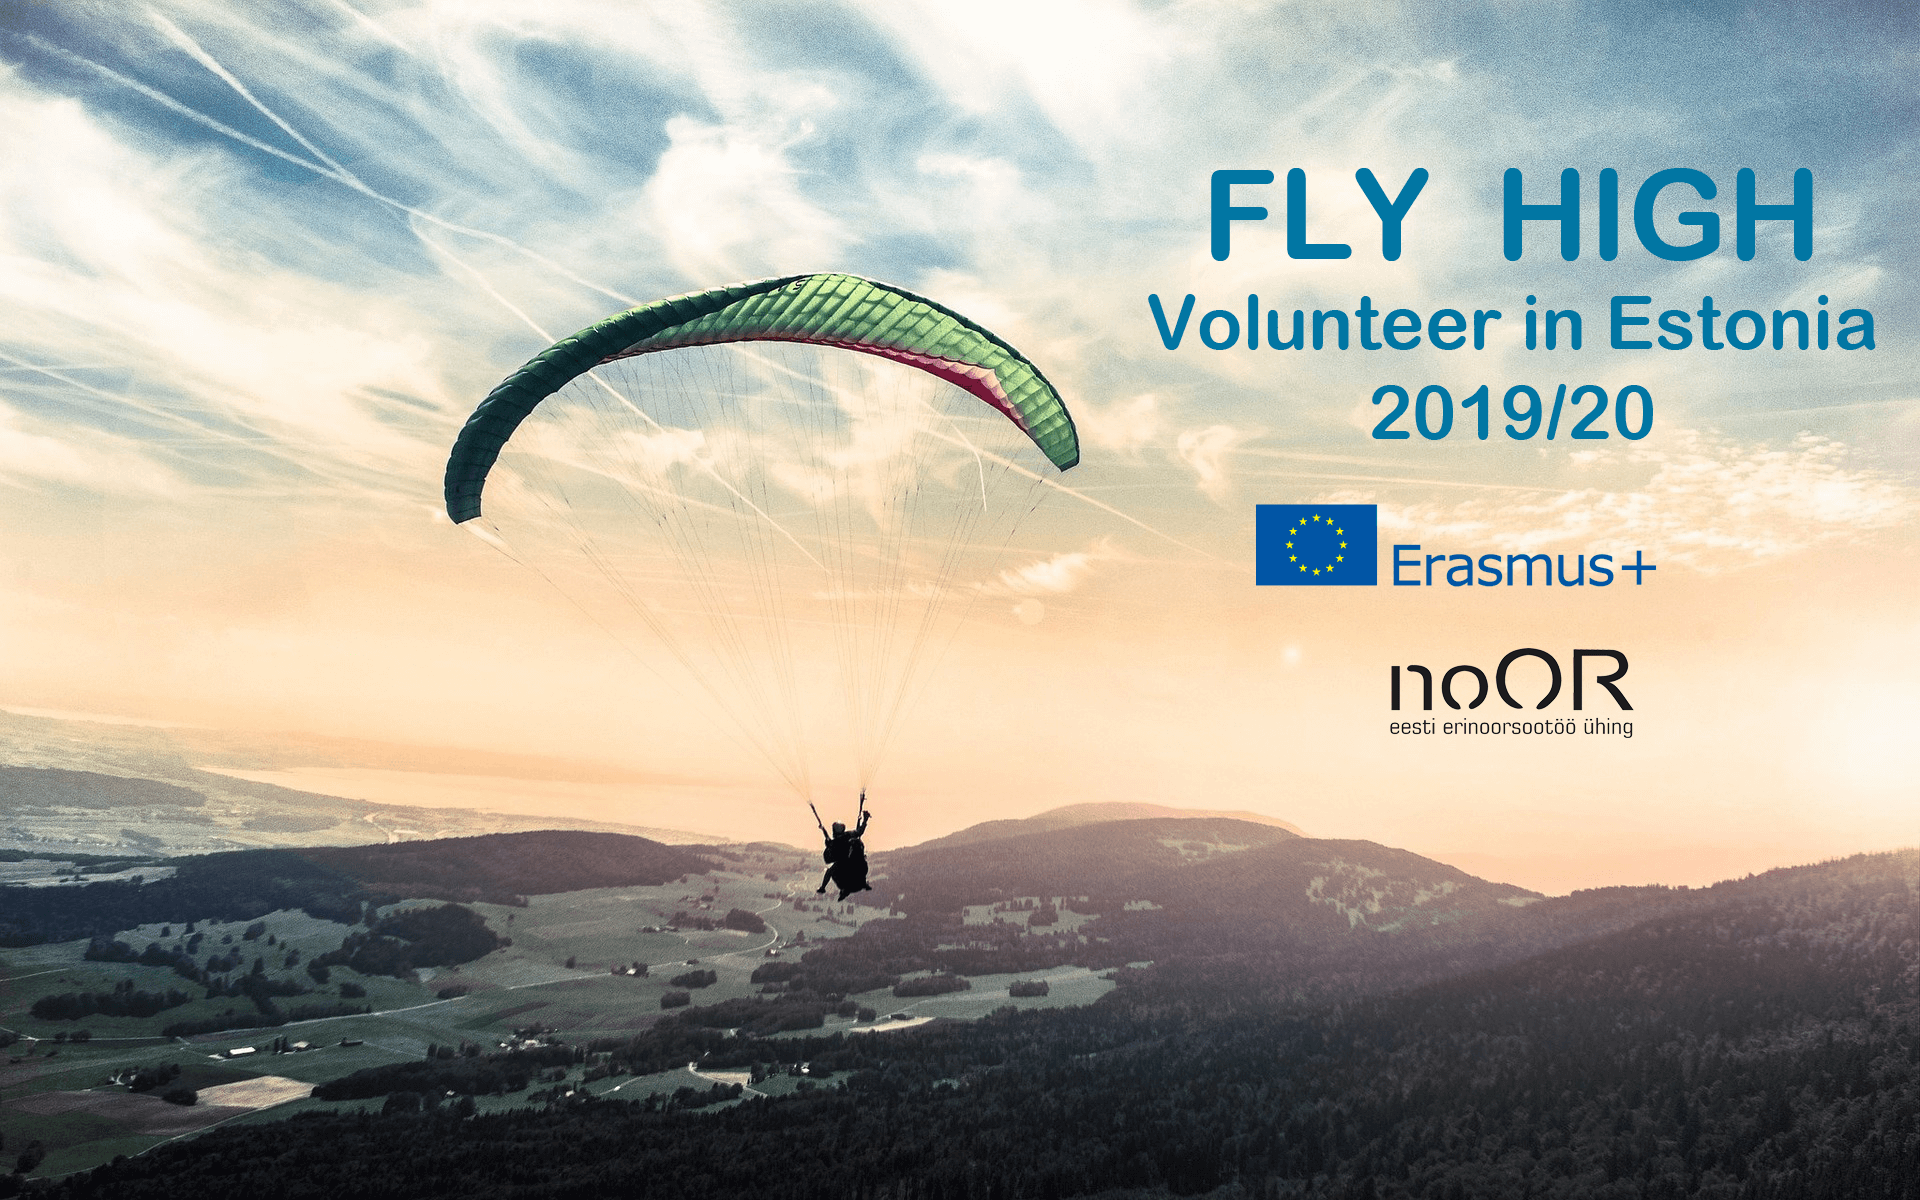 erasmus+, evs, esc. european solidarity corps, estonia, europe, youth, volunteering, volunteers, voluntouring